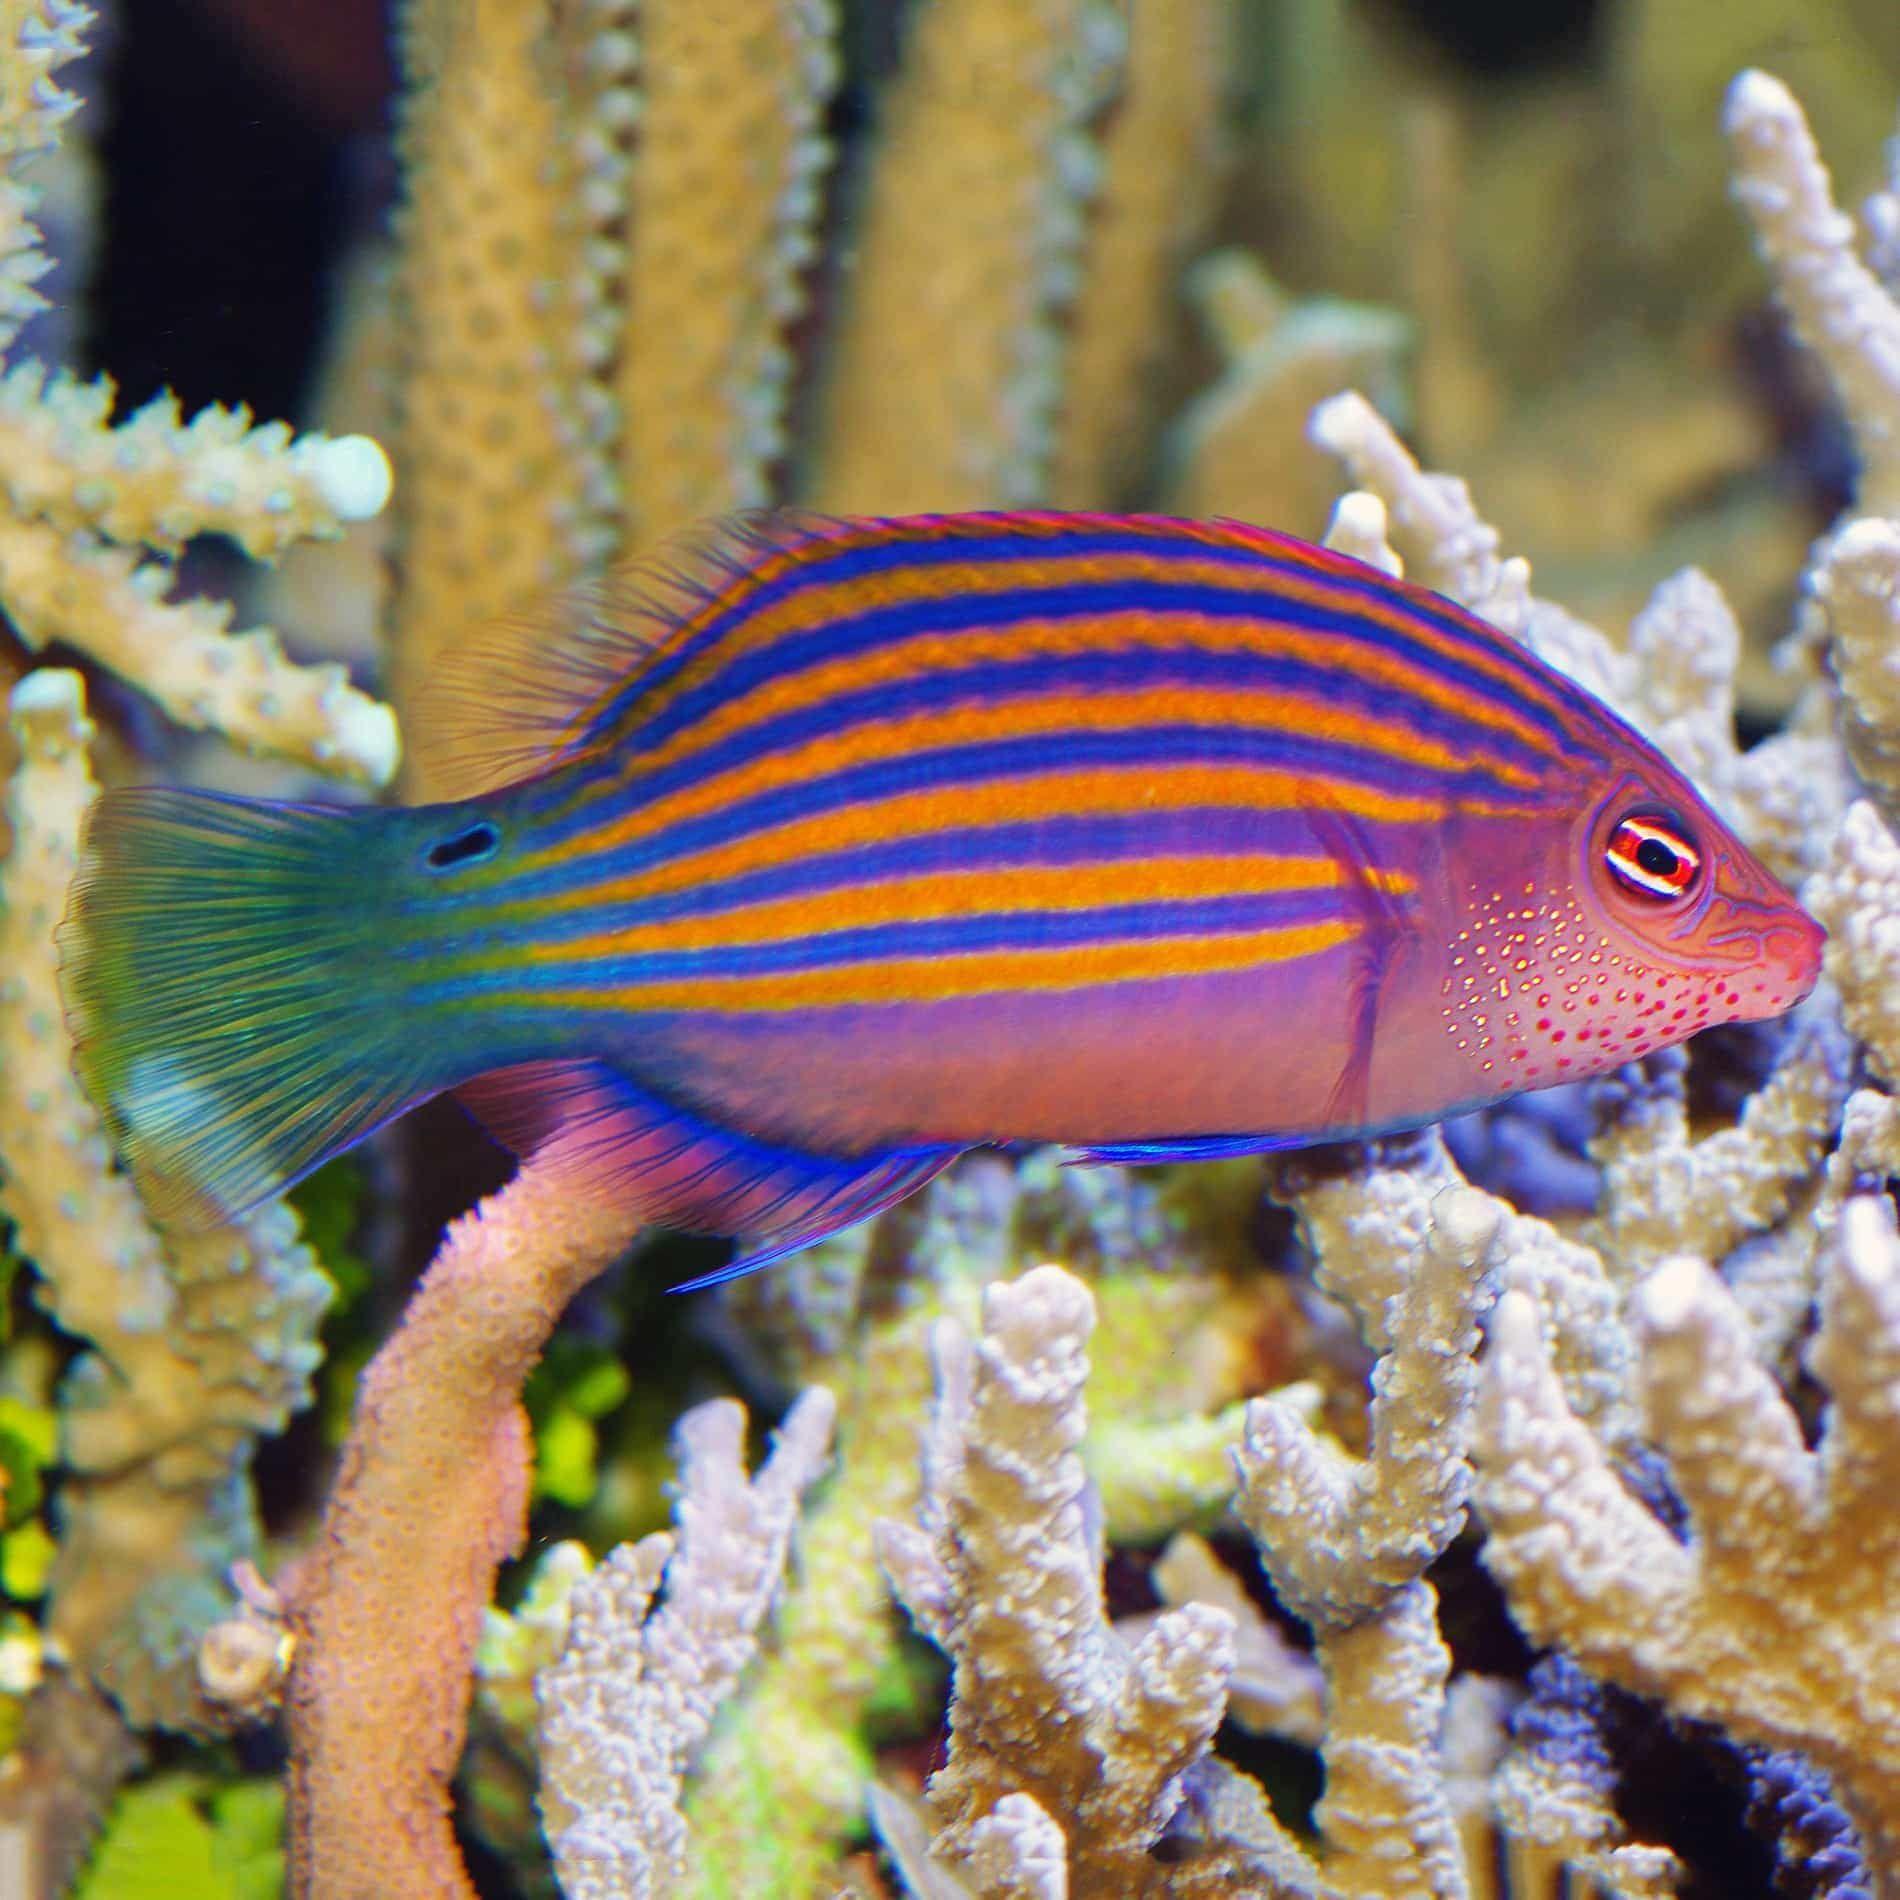 Pin By Aqualocker On Wrasse Reef Safe Live Rock Fish Rock